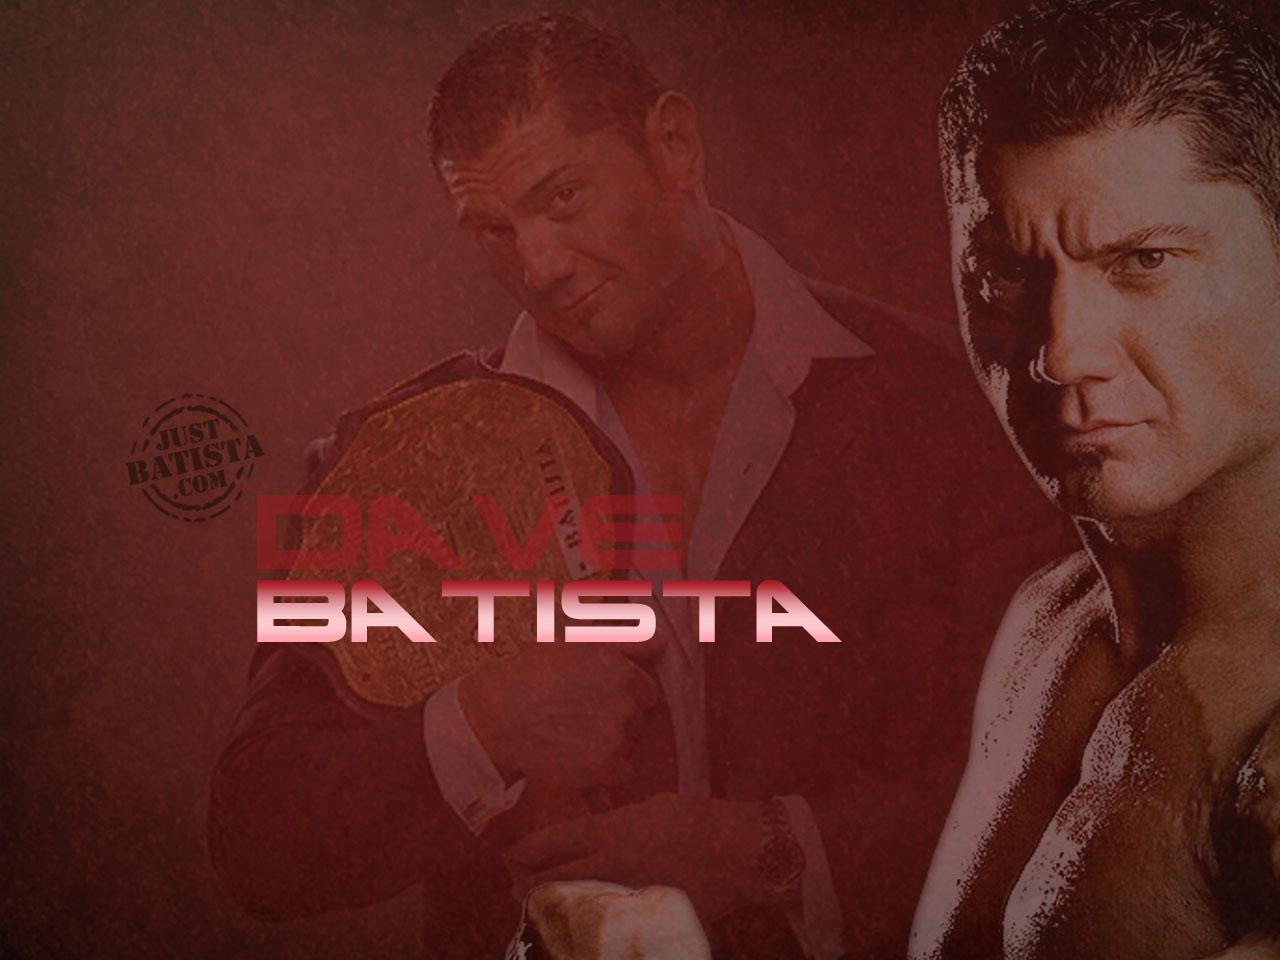 http://2.bp.blogspot.com/-3sQ-BbYxSgI/Tjhqc4ayDCI/AAAAAAAAAkc/FV7fVAtcCyg/s1600/Batista-Wallpaper-3.jpg